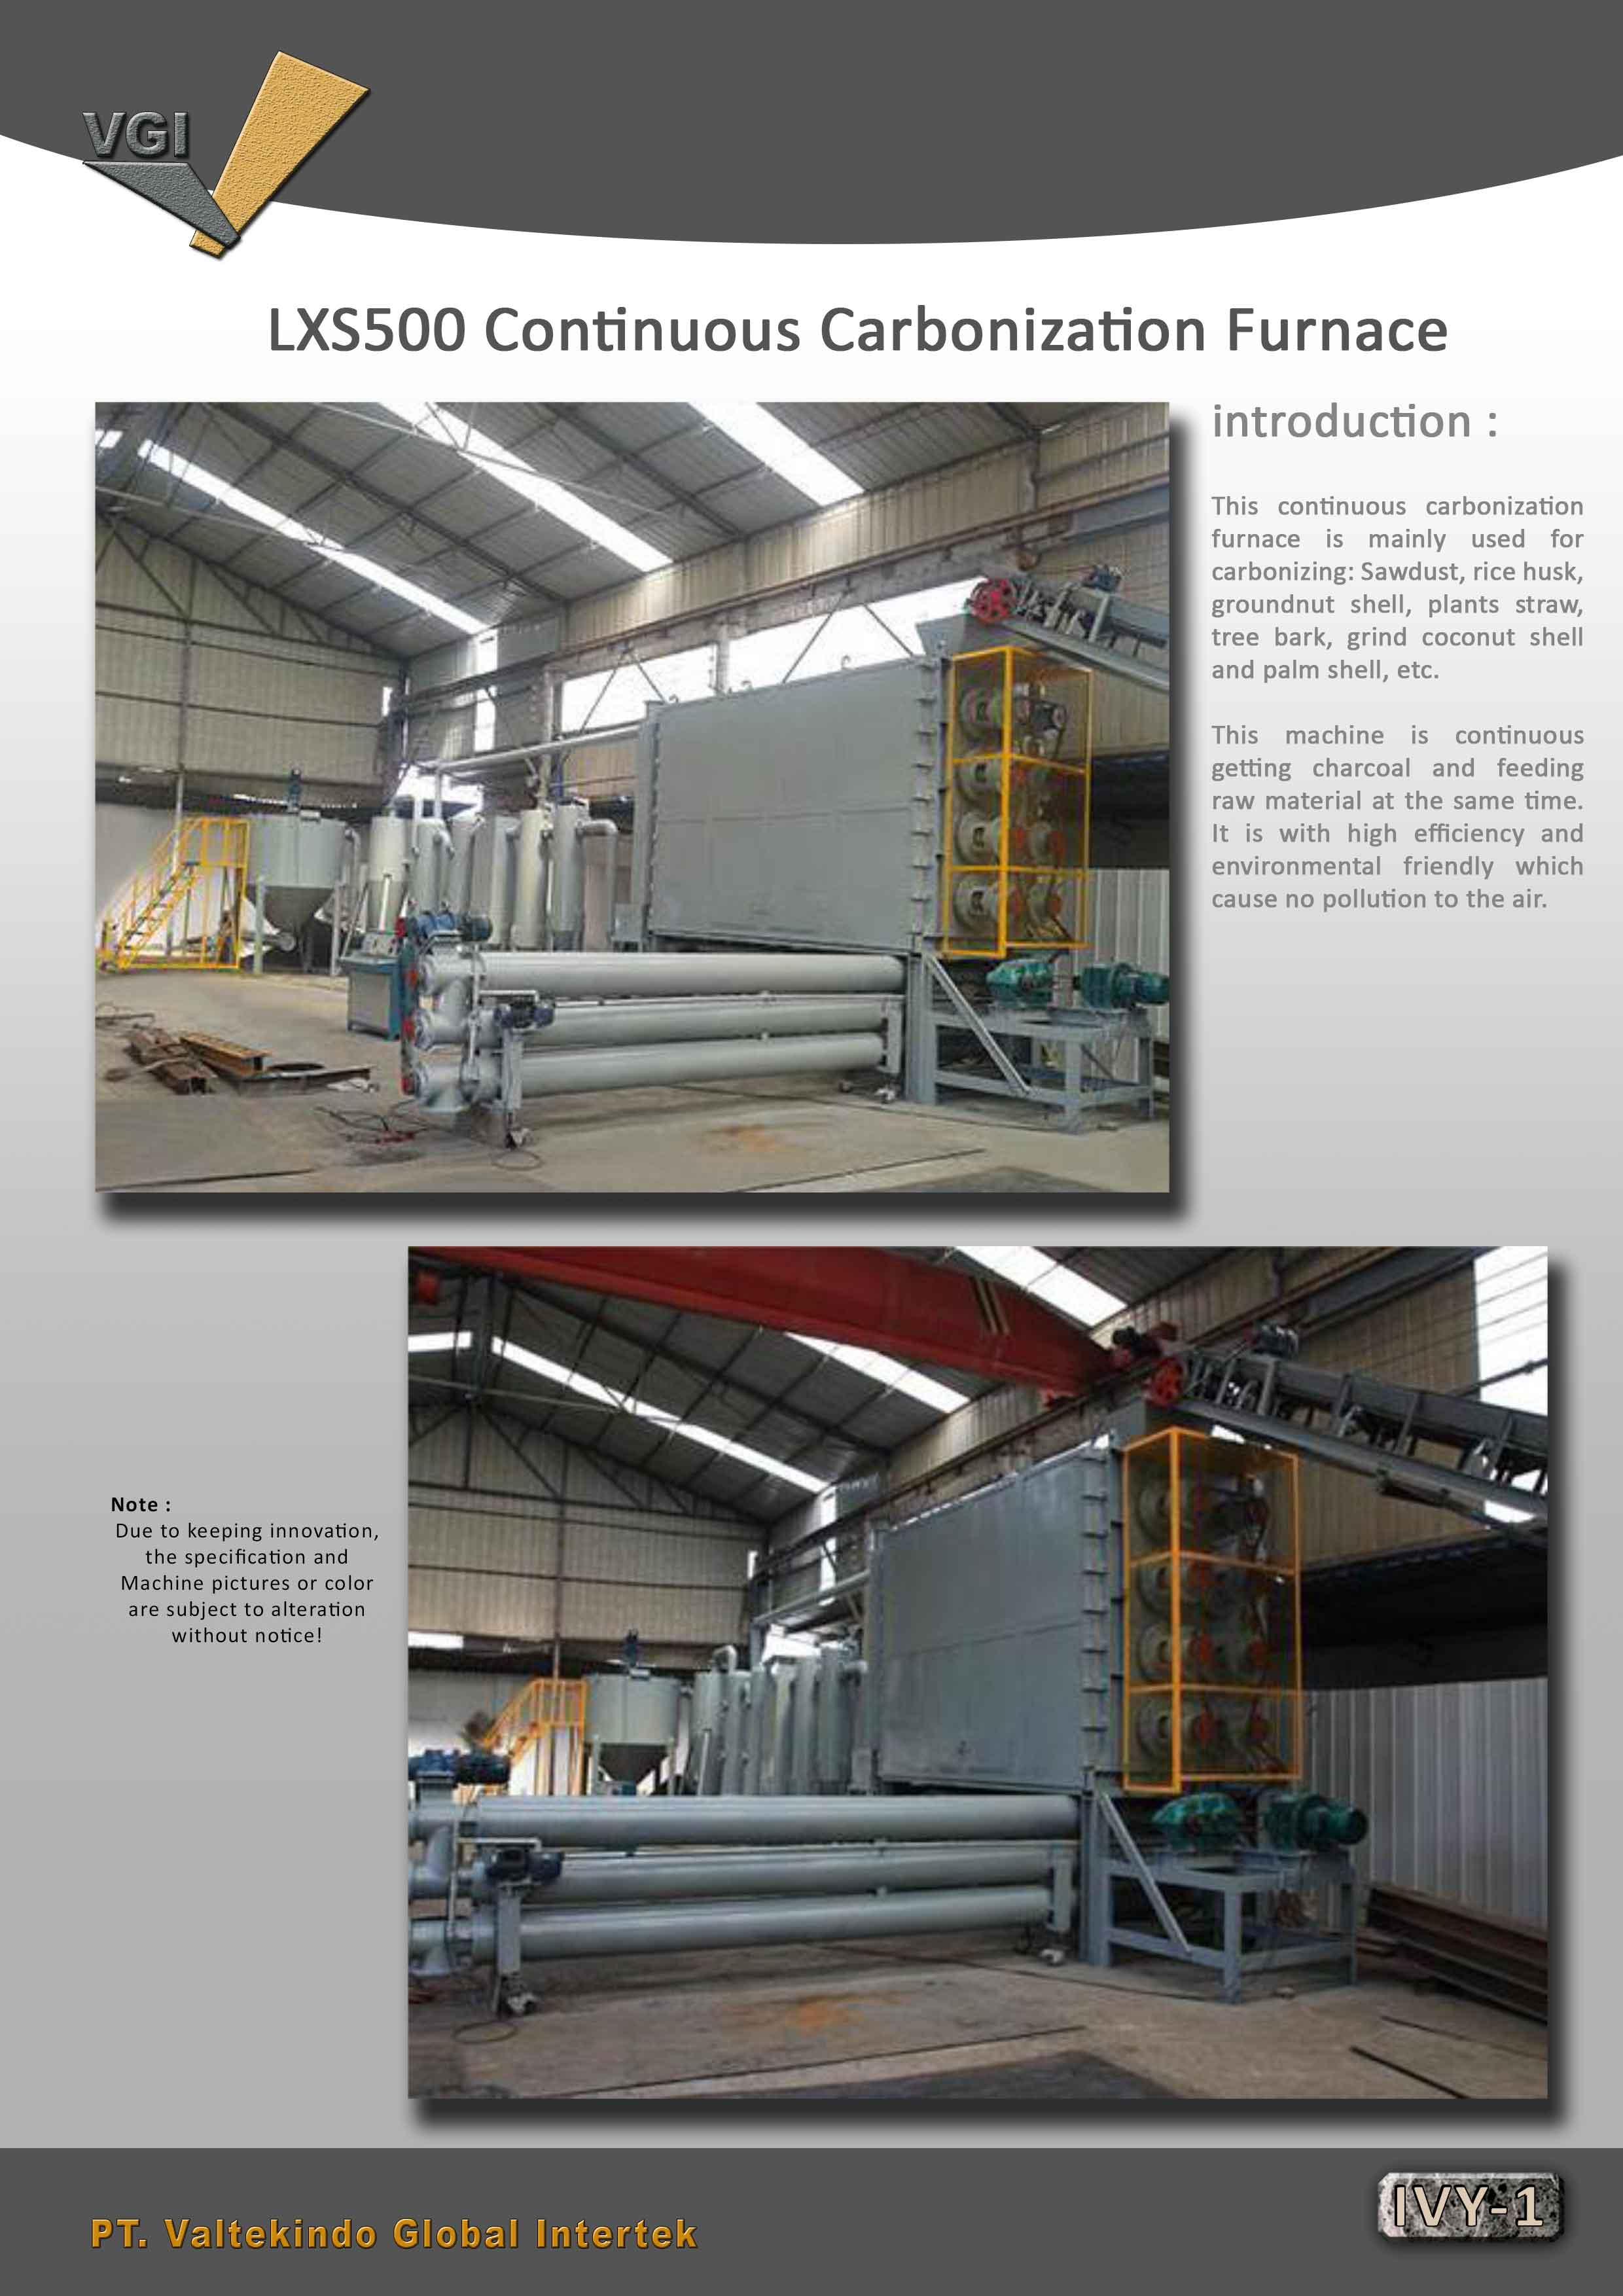 jual mesin Contniuous Carbonization Furnace (intro)